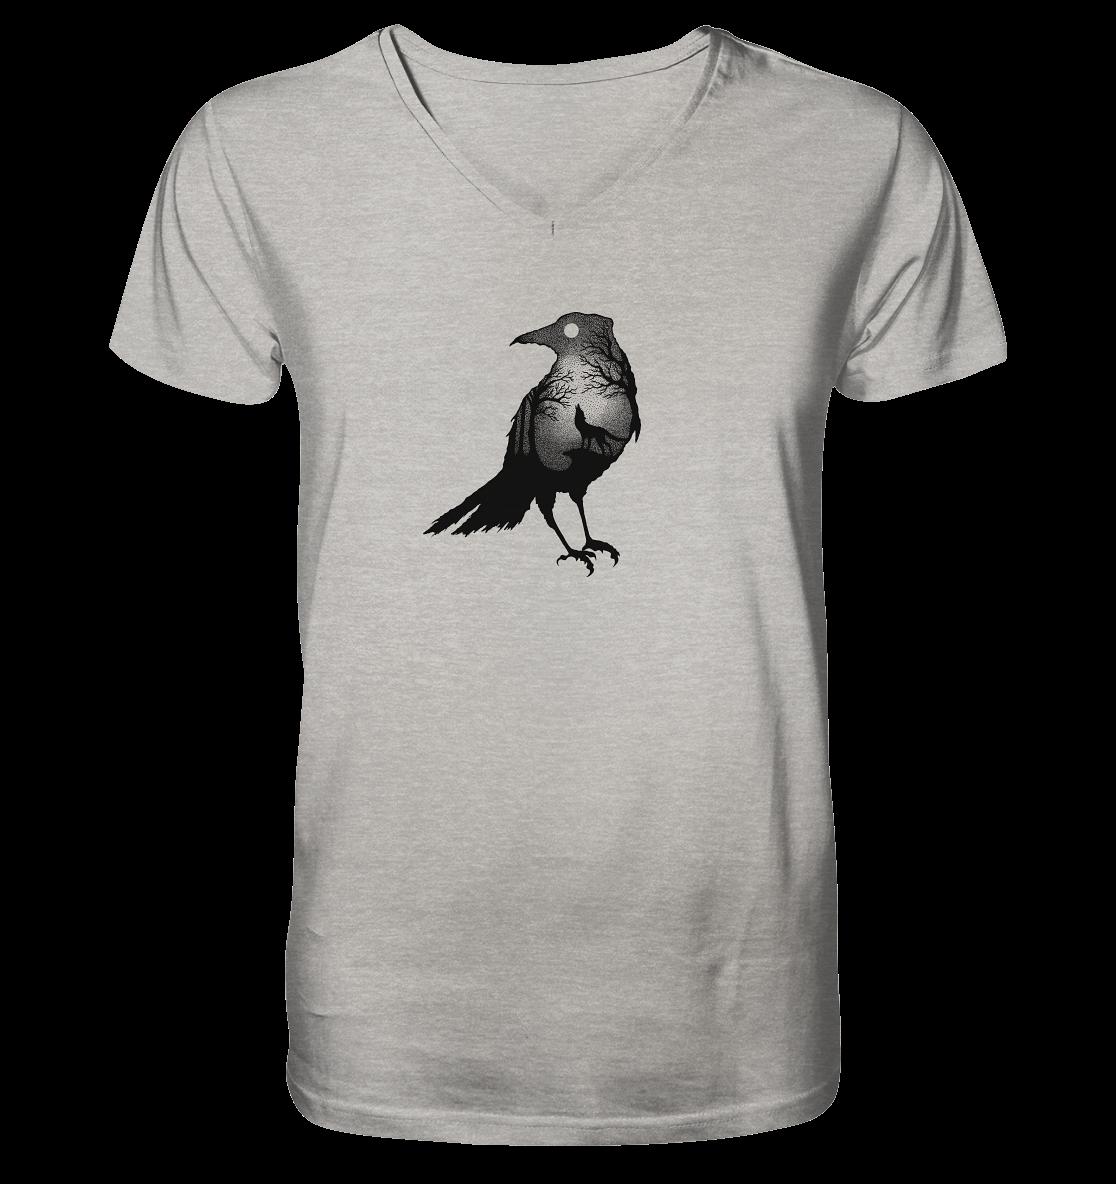 front-mens-organic-v-neck-shirt-c2c1c0-1116x-2.png